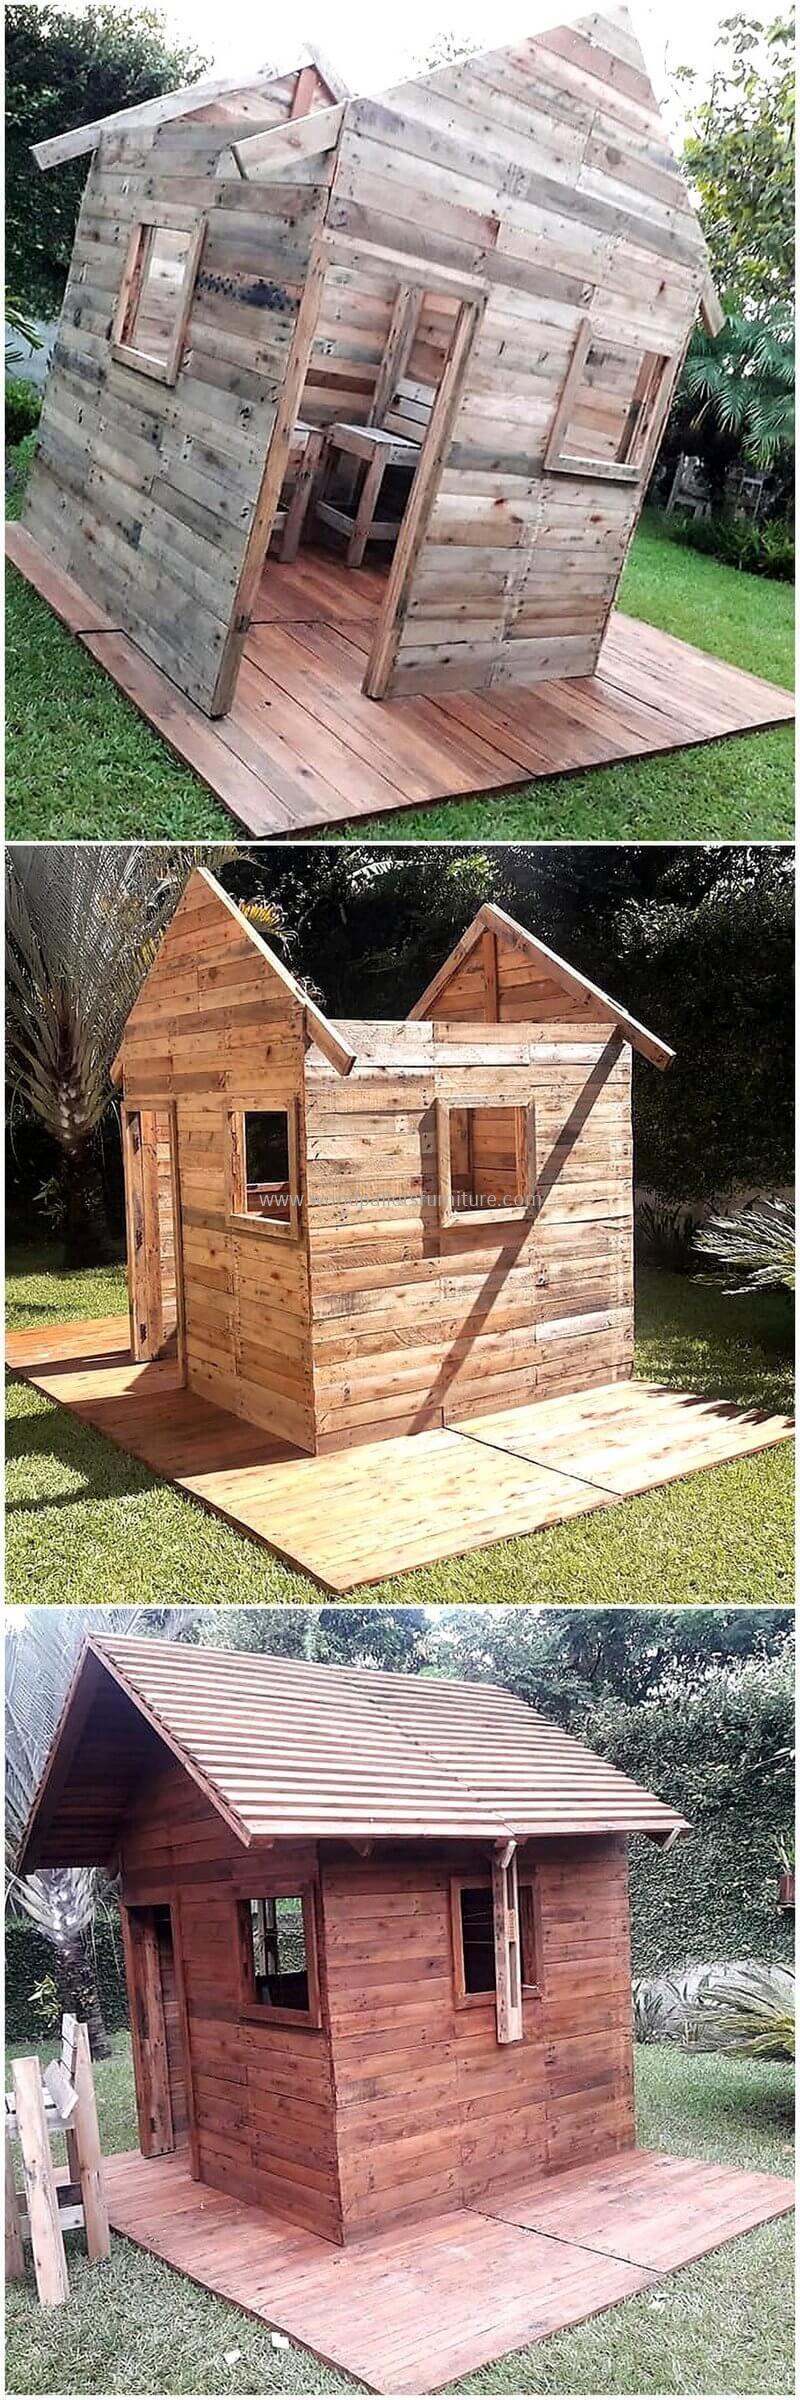 Original Diy Ideas For Wooden Pallets Recycling Pallet Diy Ideas